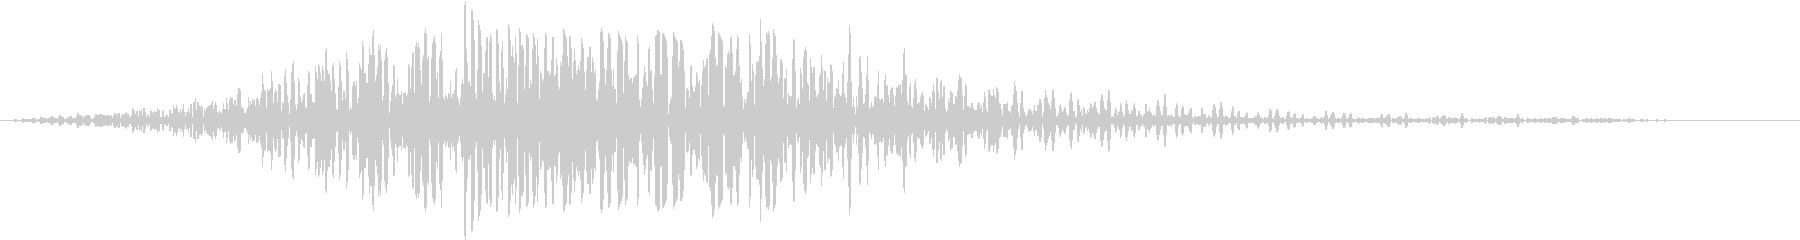 SF通過音02-04の未再生の波形